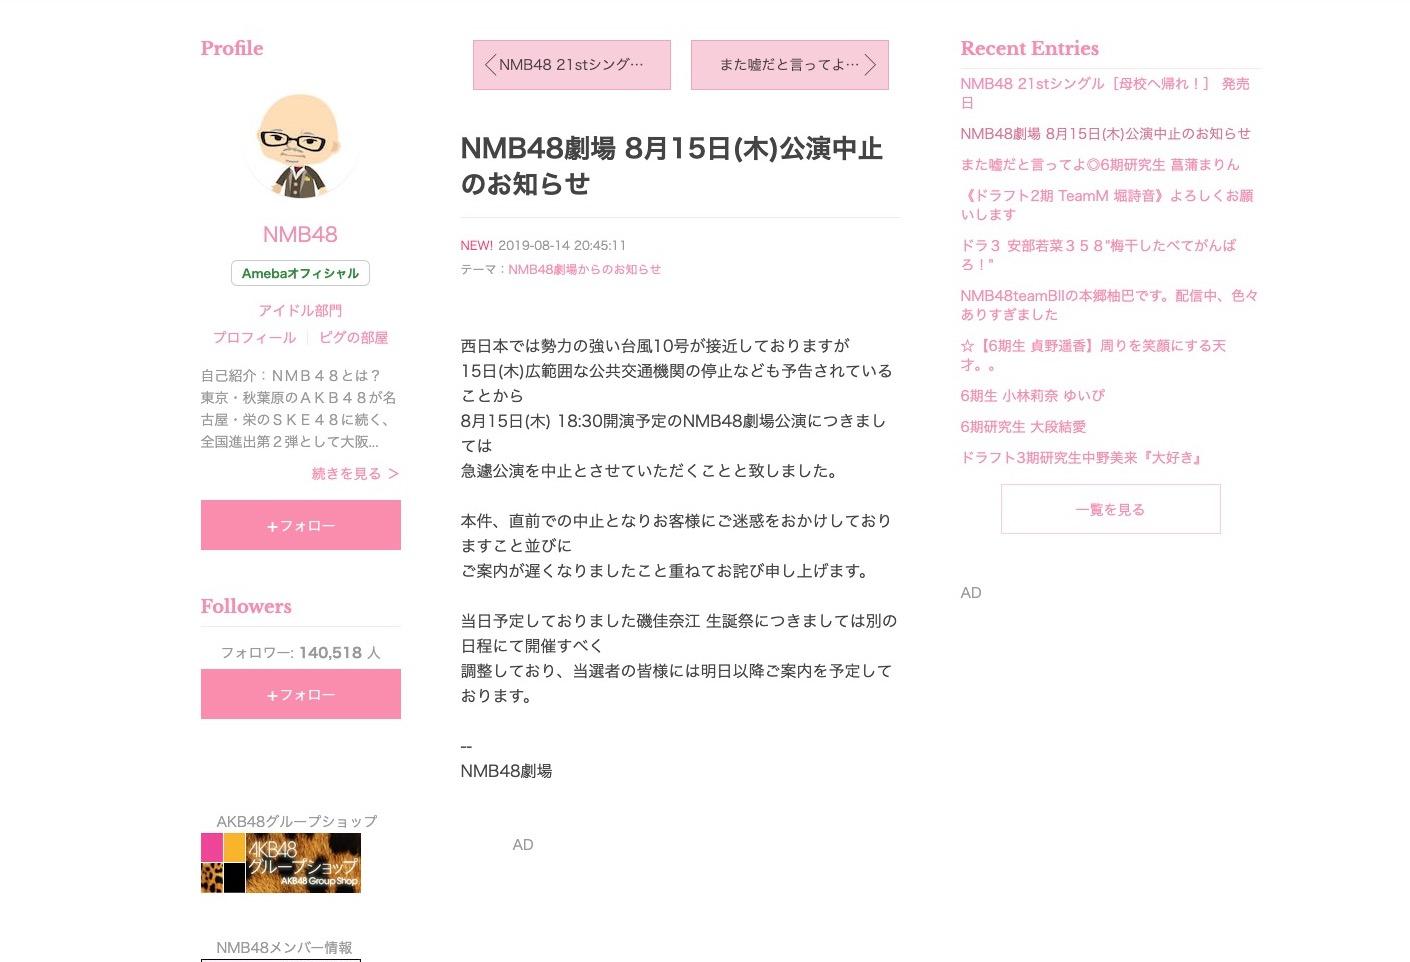 【NMB48】8月15日のチームN「N Pride」公演が台風接近のため中止に。